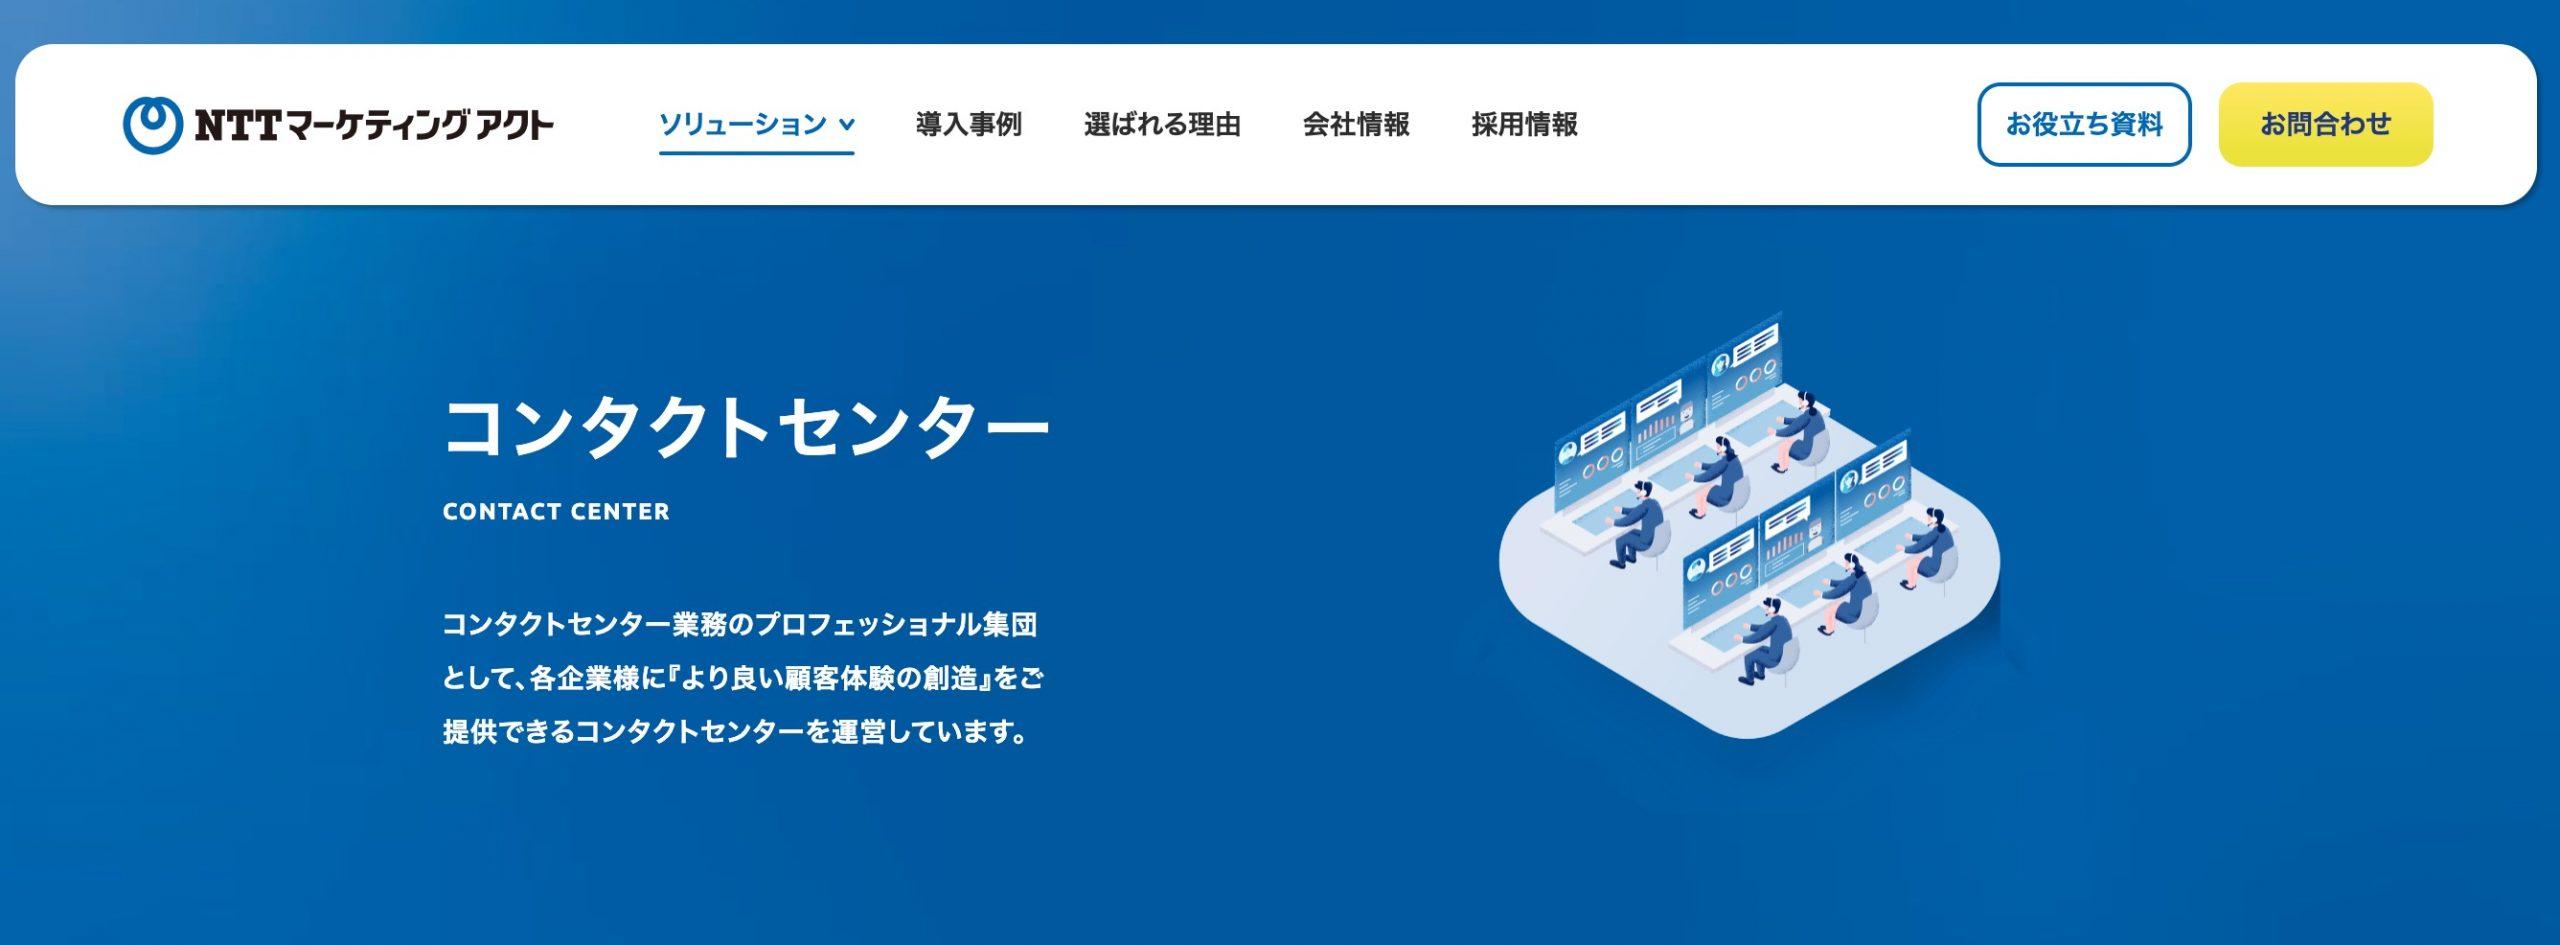 NTTマーケティングアウト